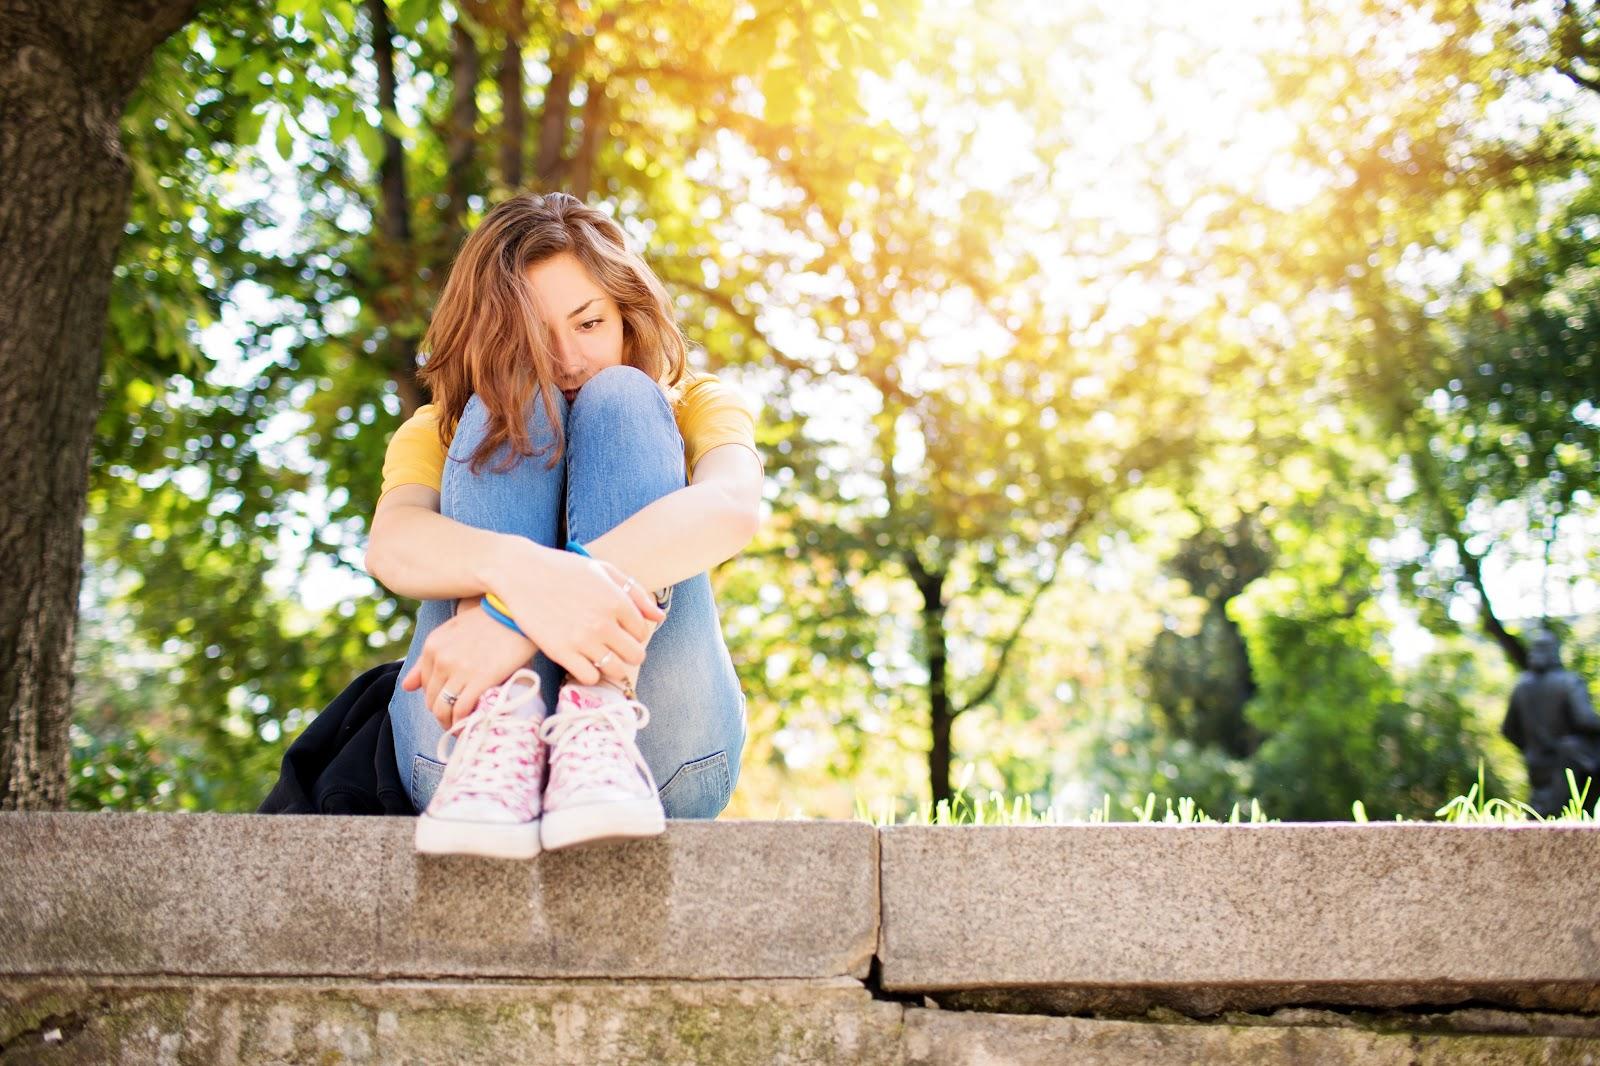 depressed-teenage-girl-497441764-581fa6fb3df78cc2e83f8b37.jpg